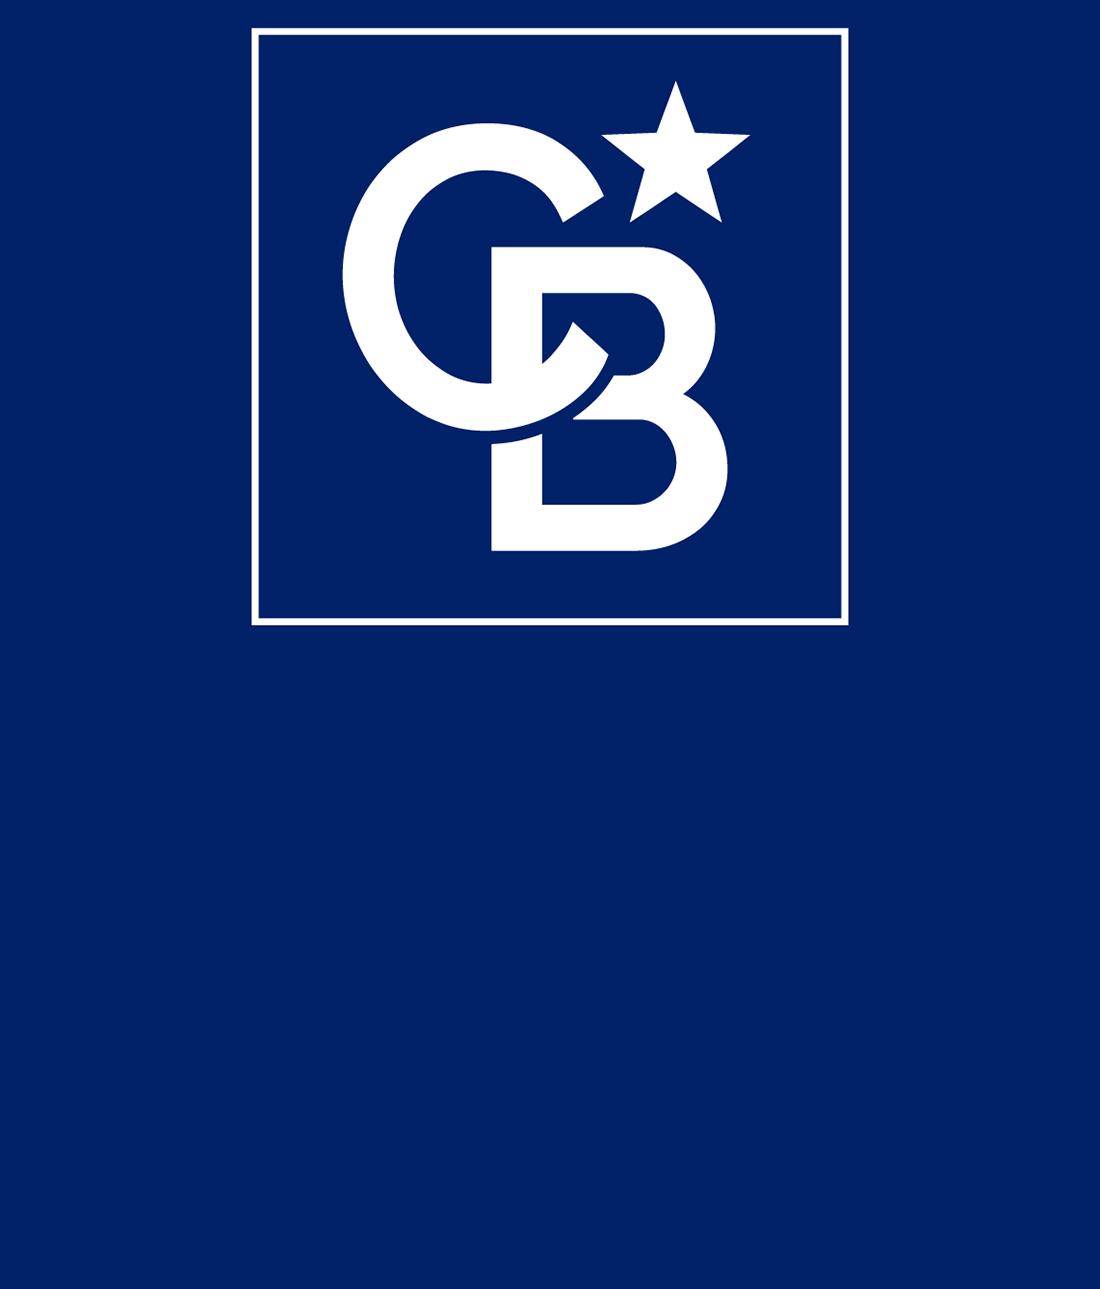 cbhs04 Logo